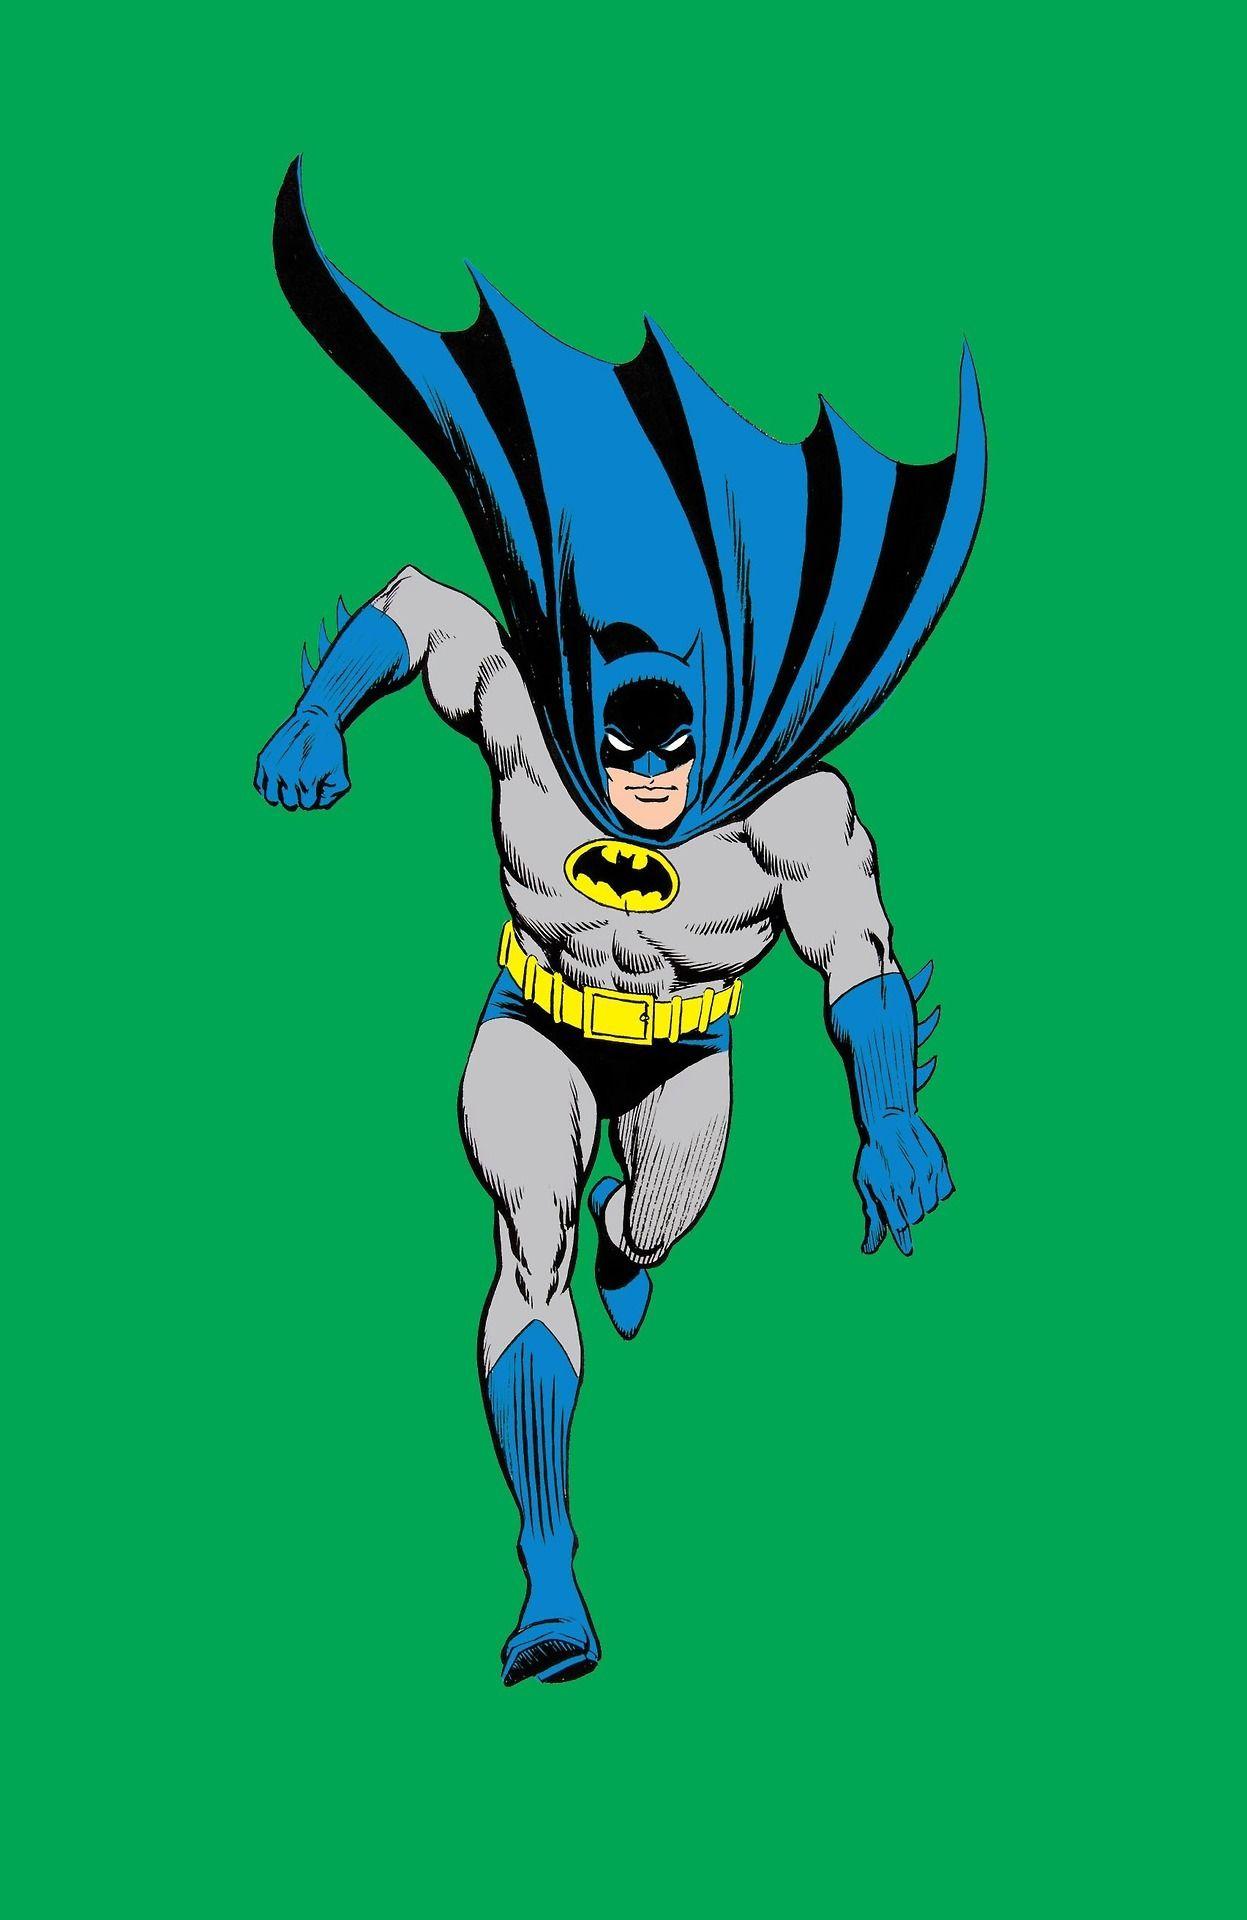 Batman art by Carmine Infantino. Batman artwork, Batman